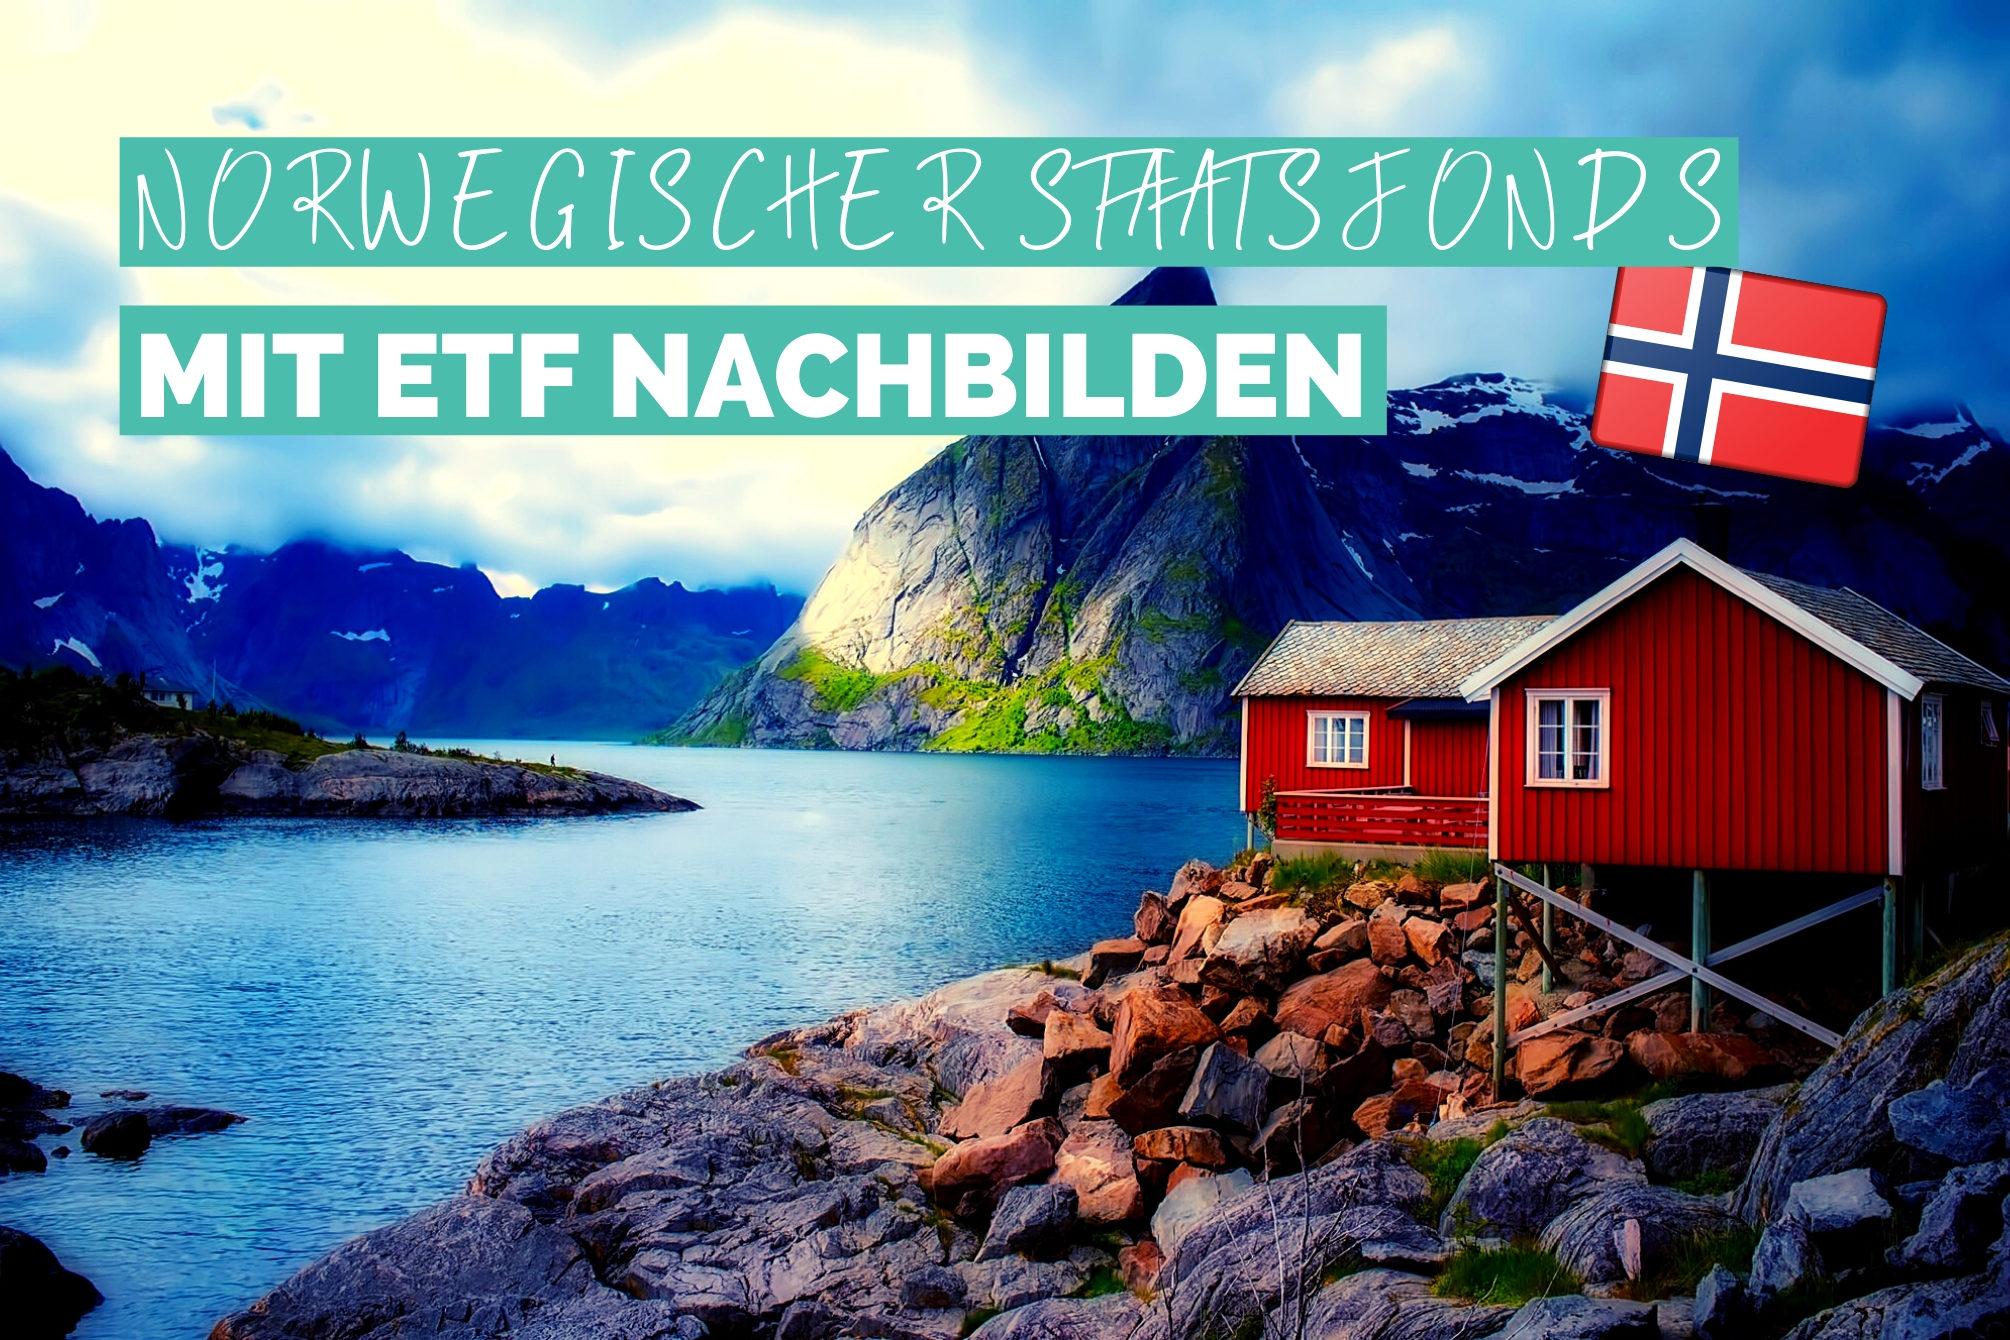 Norwegischer Staatsfonds mit ETF nachbilden